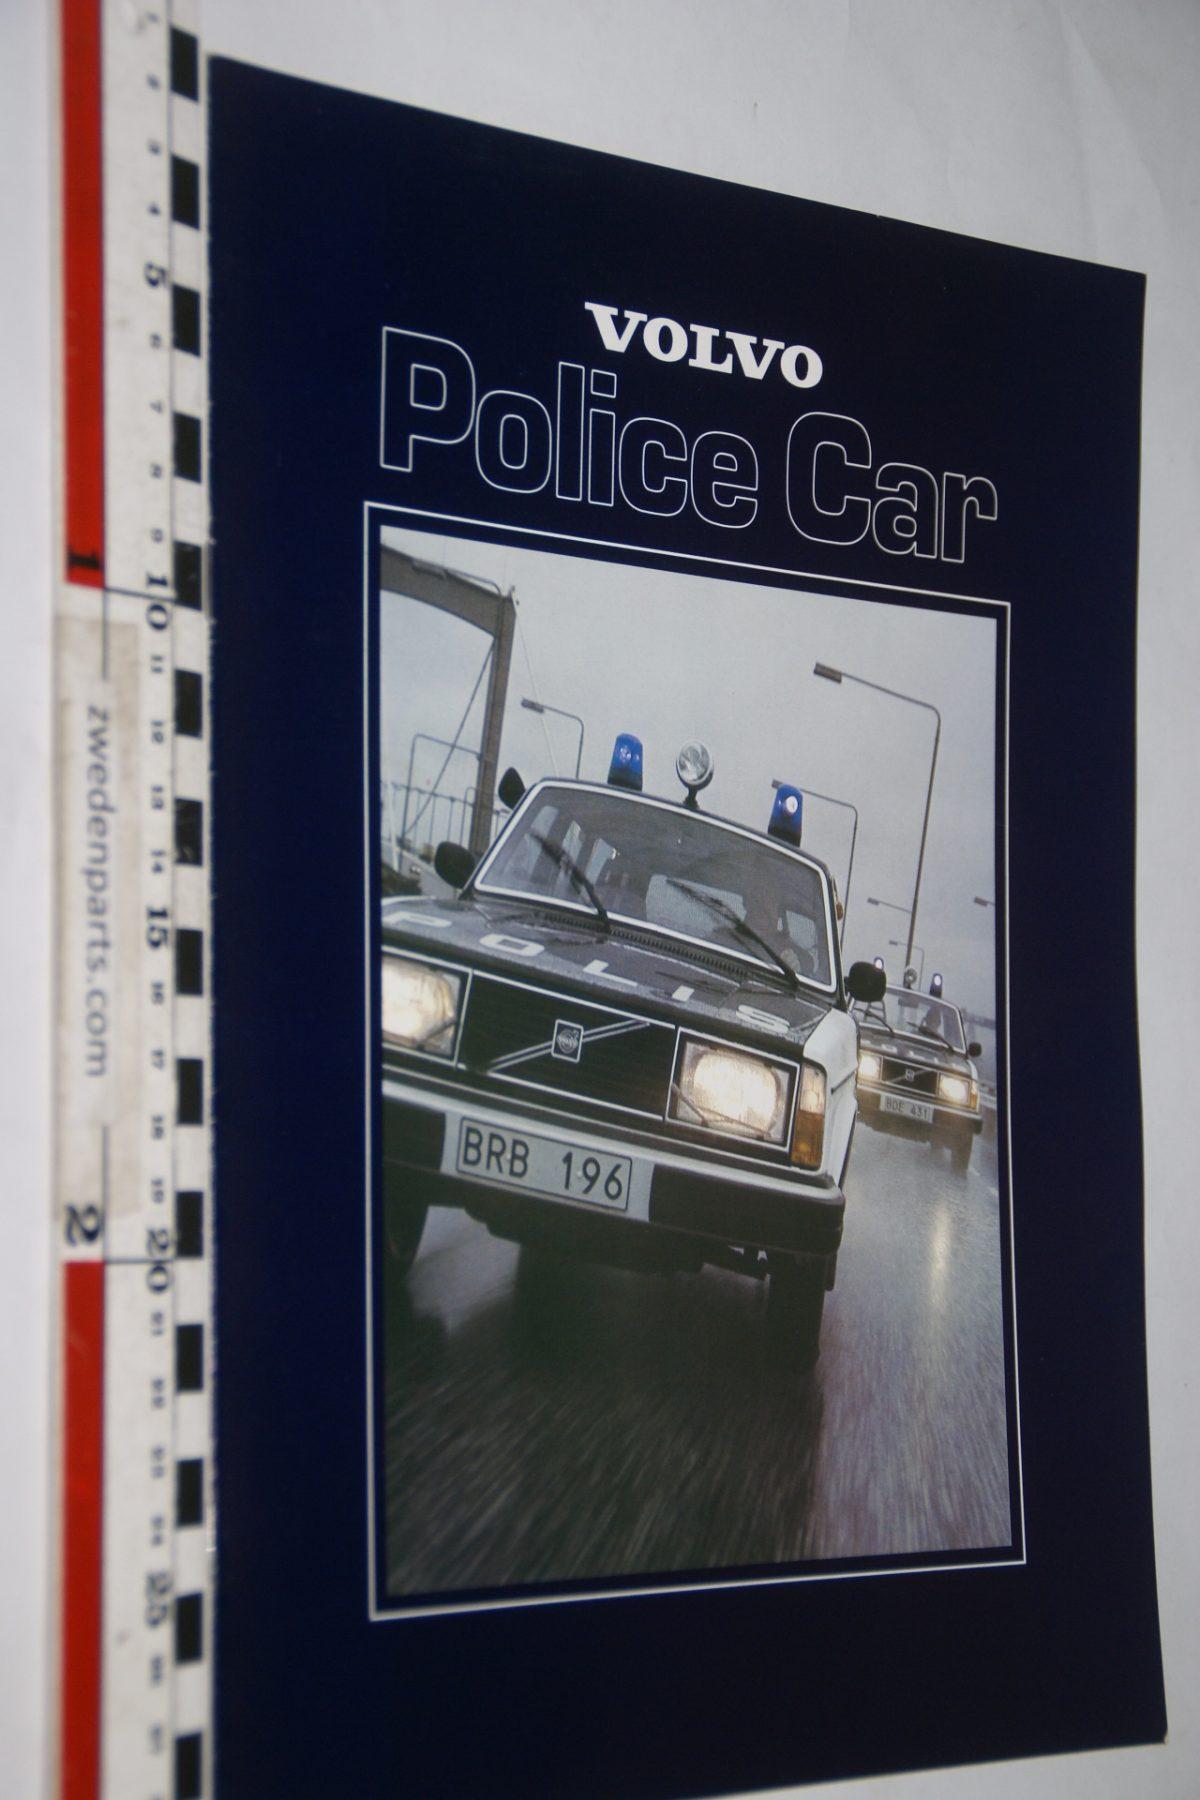 DSC05564 1979 brochure Volvo 240 Police Car nr ASP-PV 6830 Engels